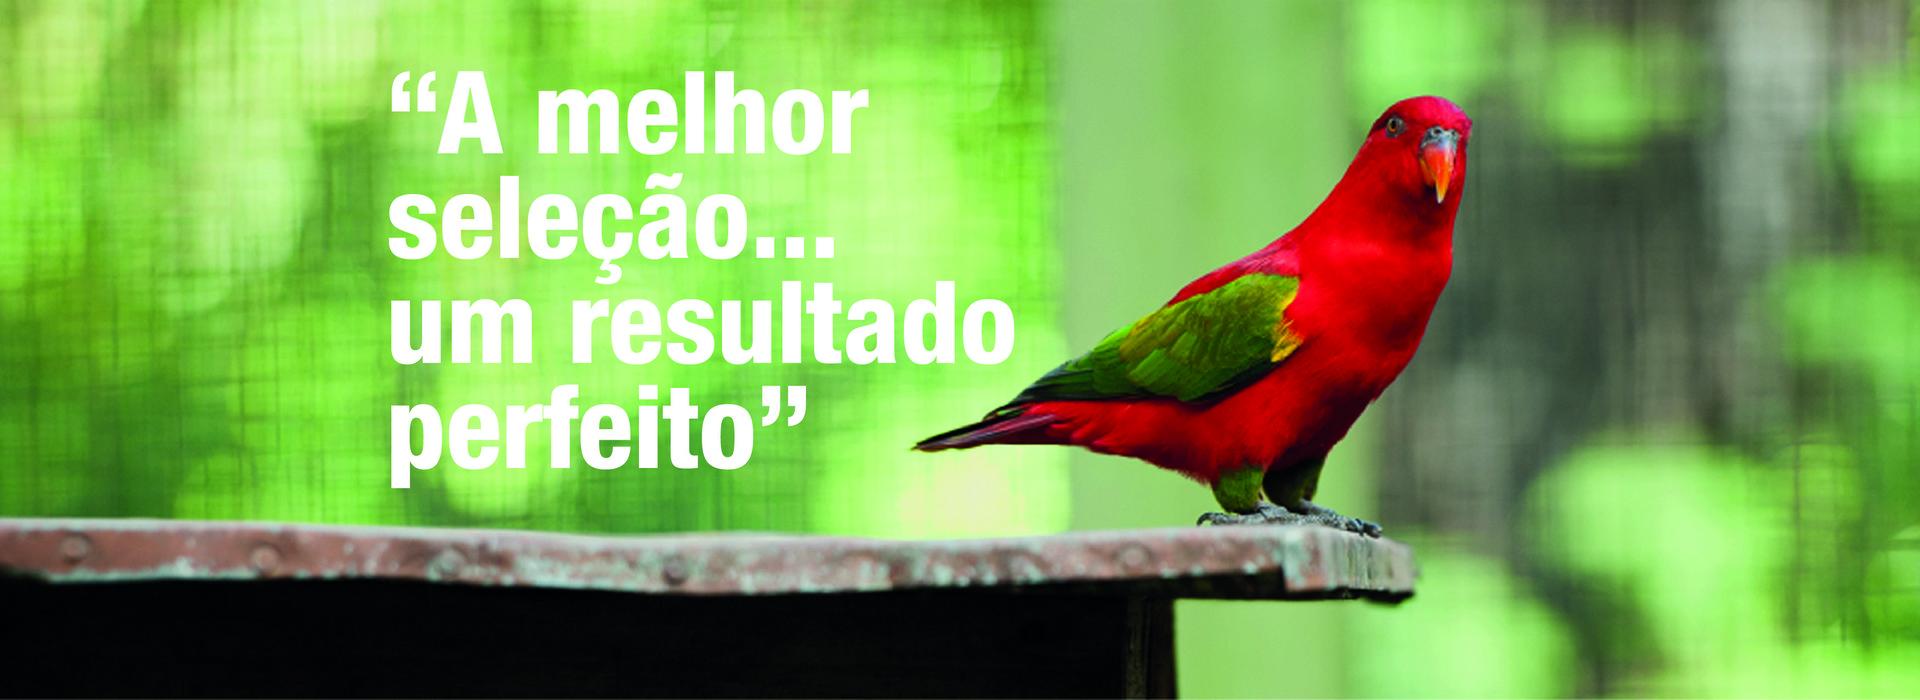 banner_passaros_F